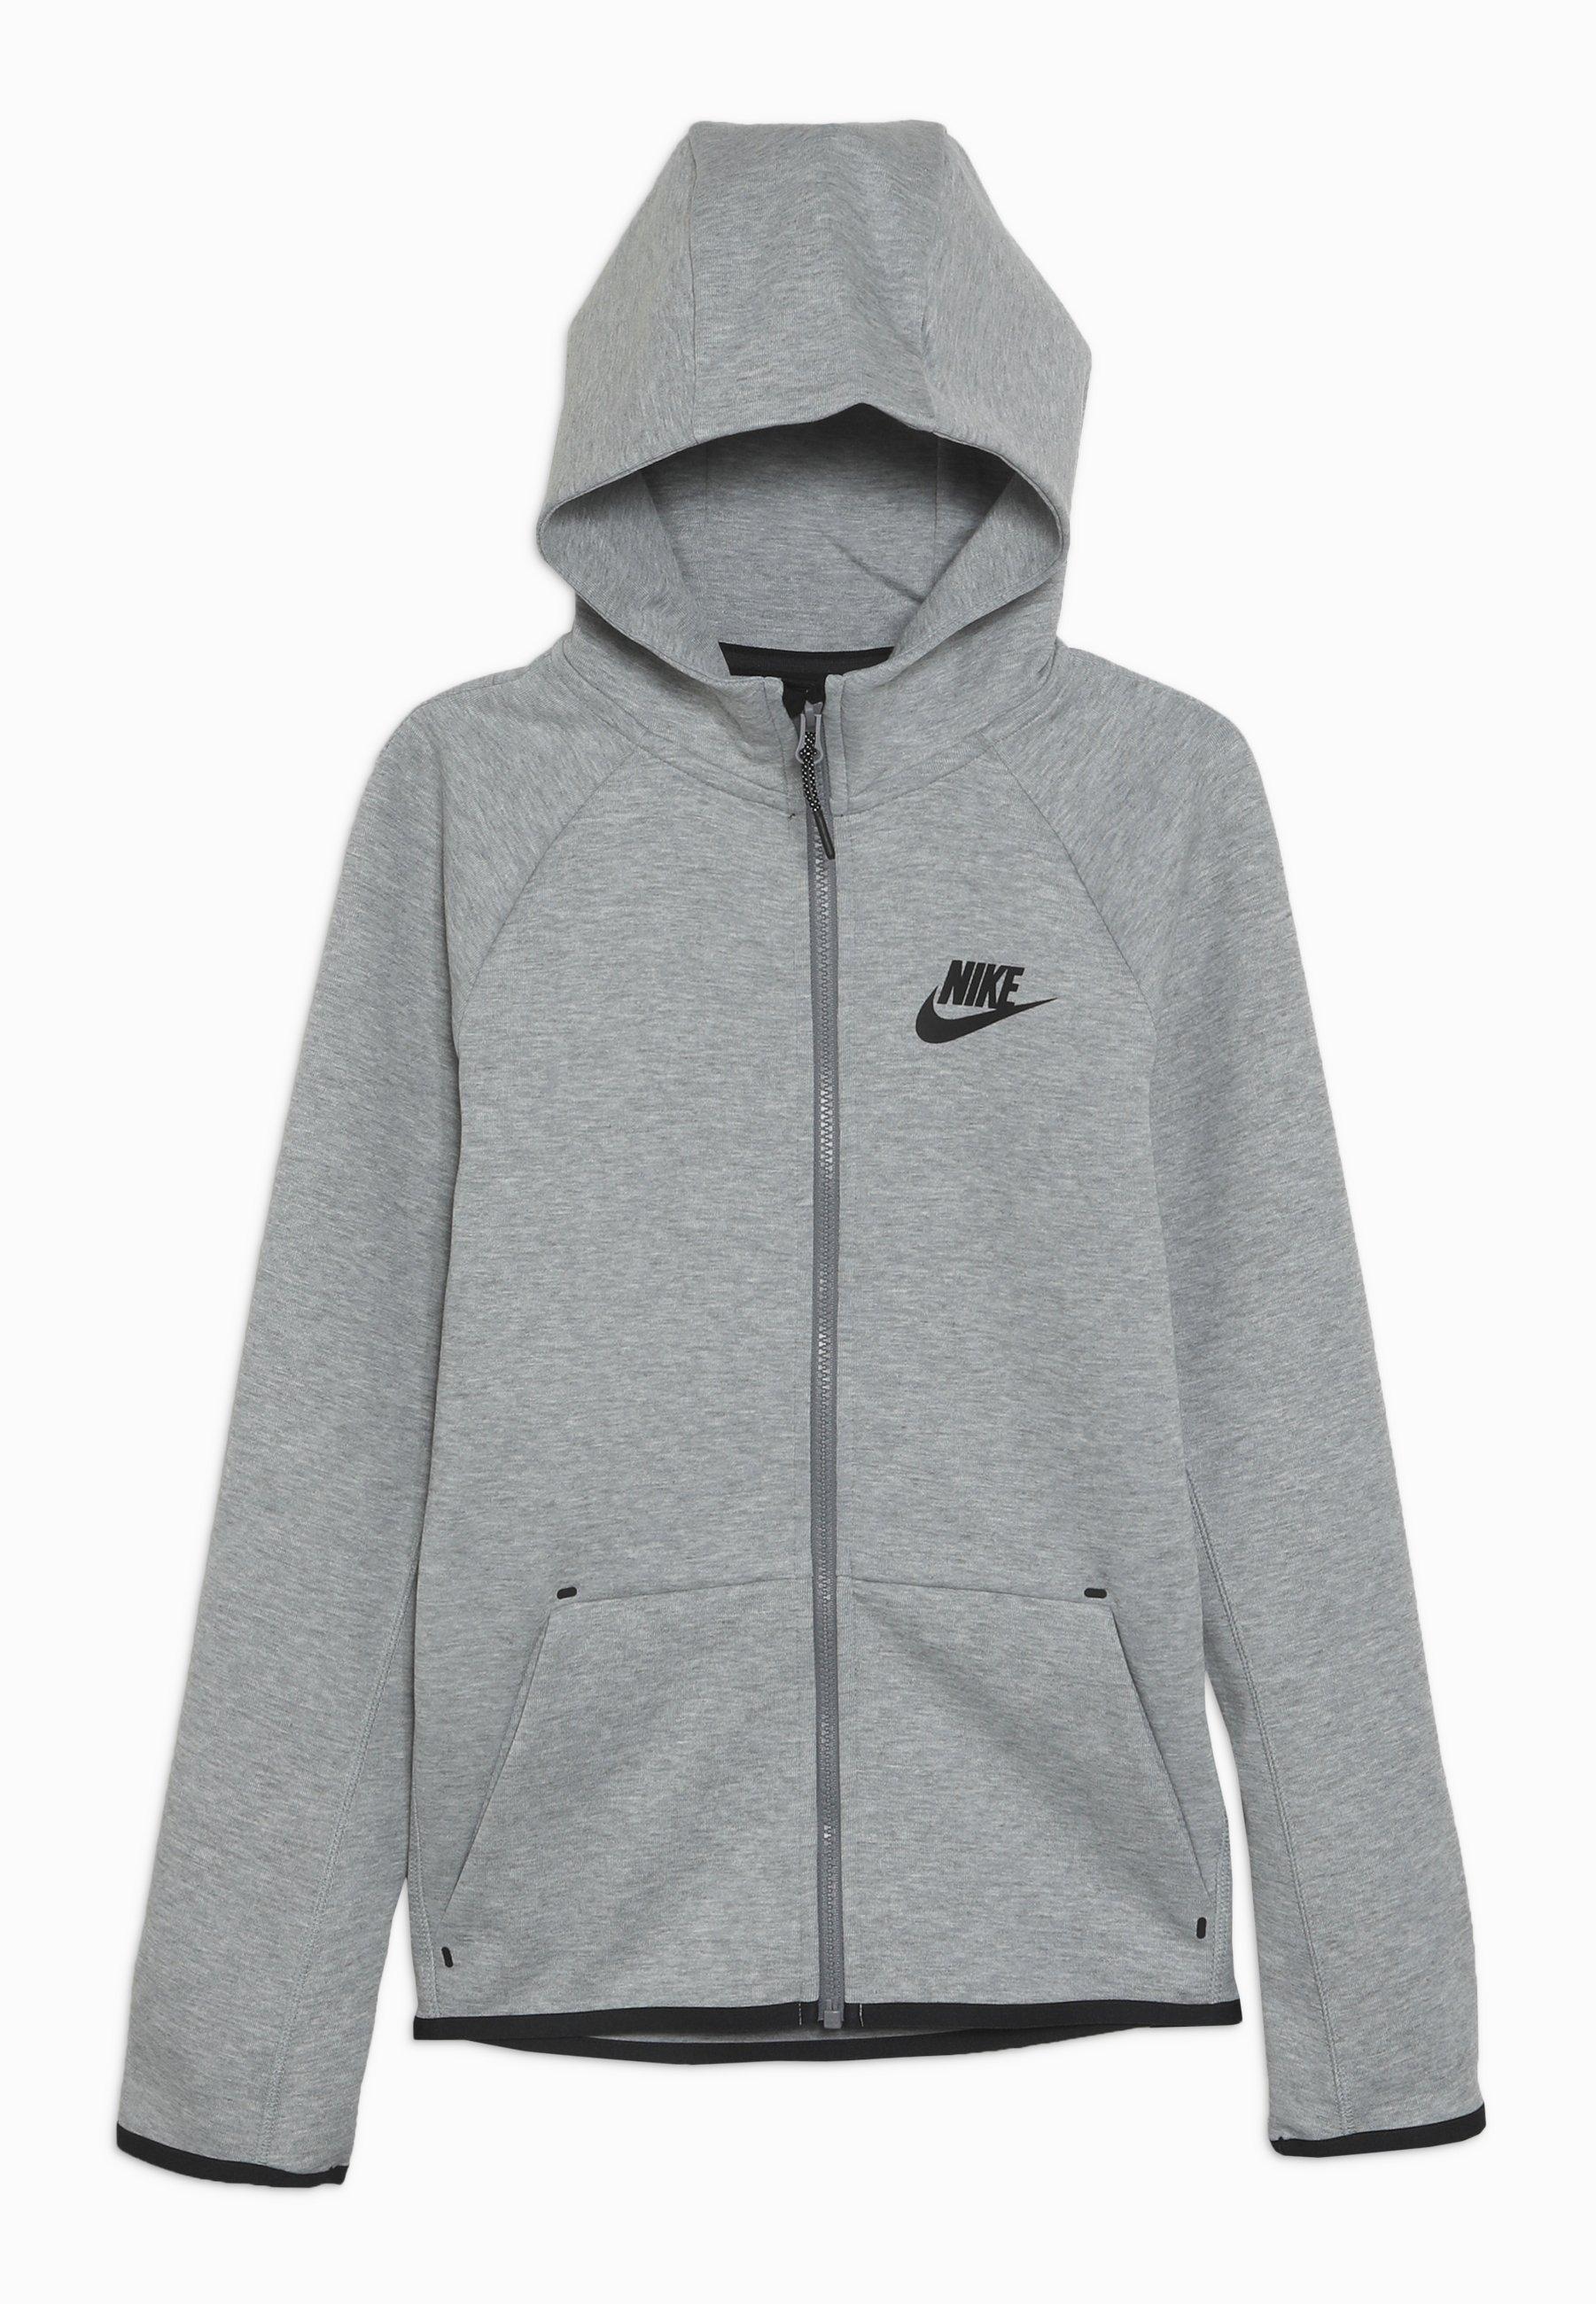 Nike Sportswear Tech Fleece Essentials Zip Up Hoodie Dark Grey Heather Black Mottled Dark Grey Zalando Co Uk